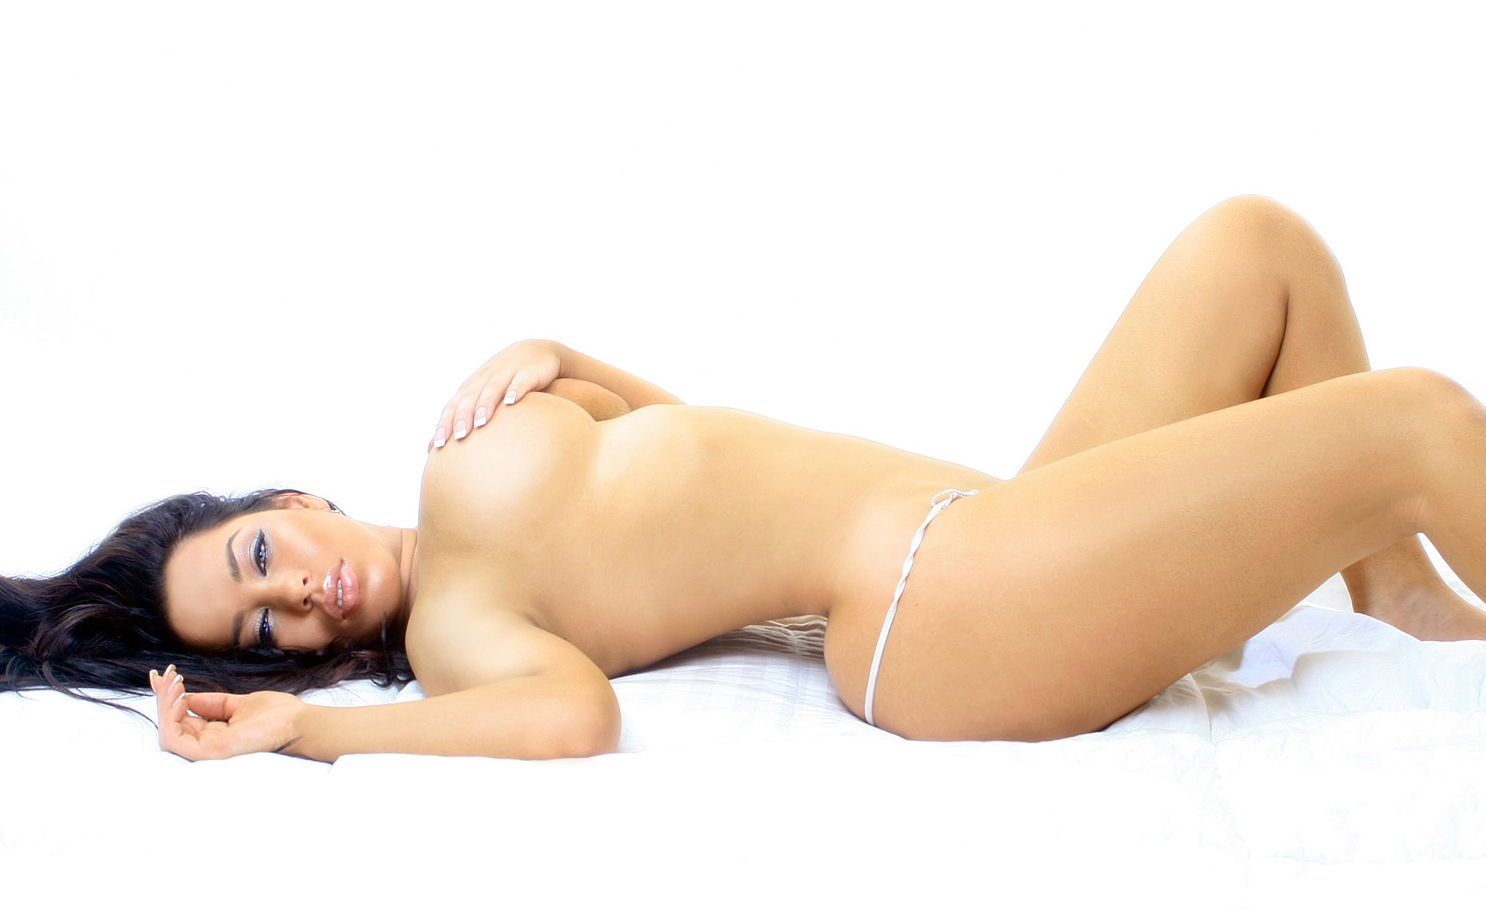 halle barry nude videos